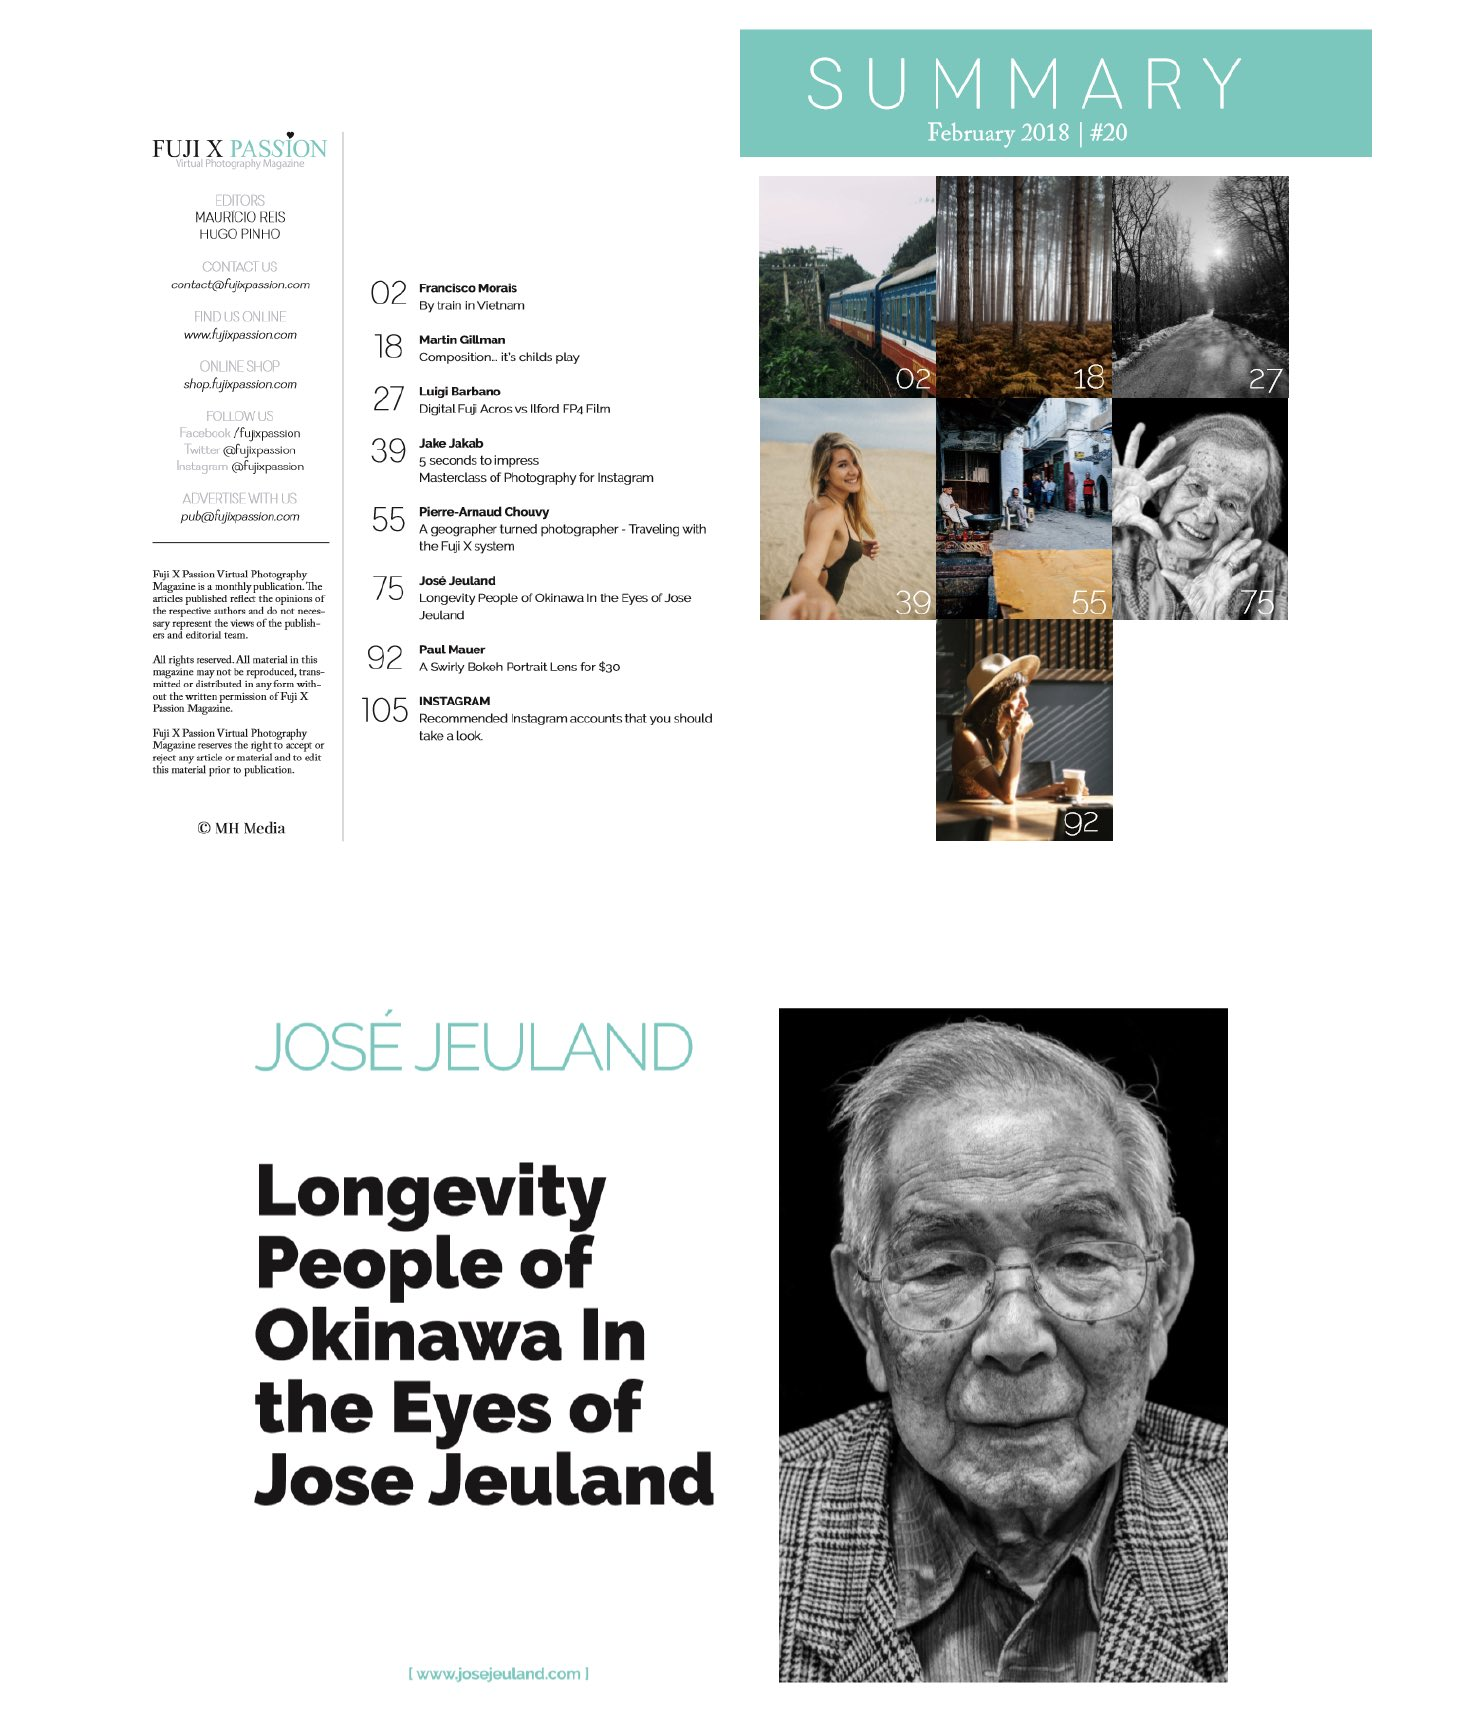 FUJI X Passion Longevity Okinawa Jose Jeuland 2